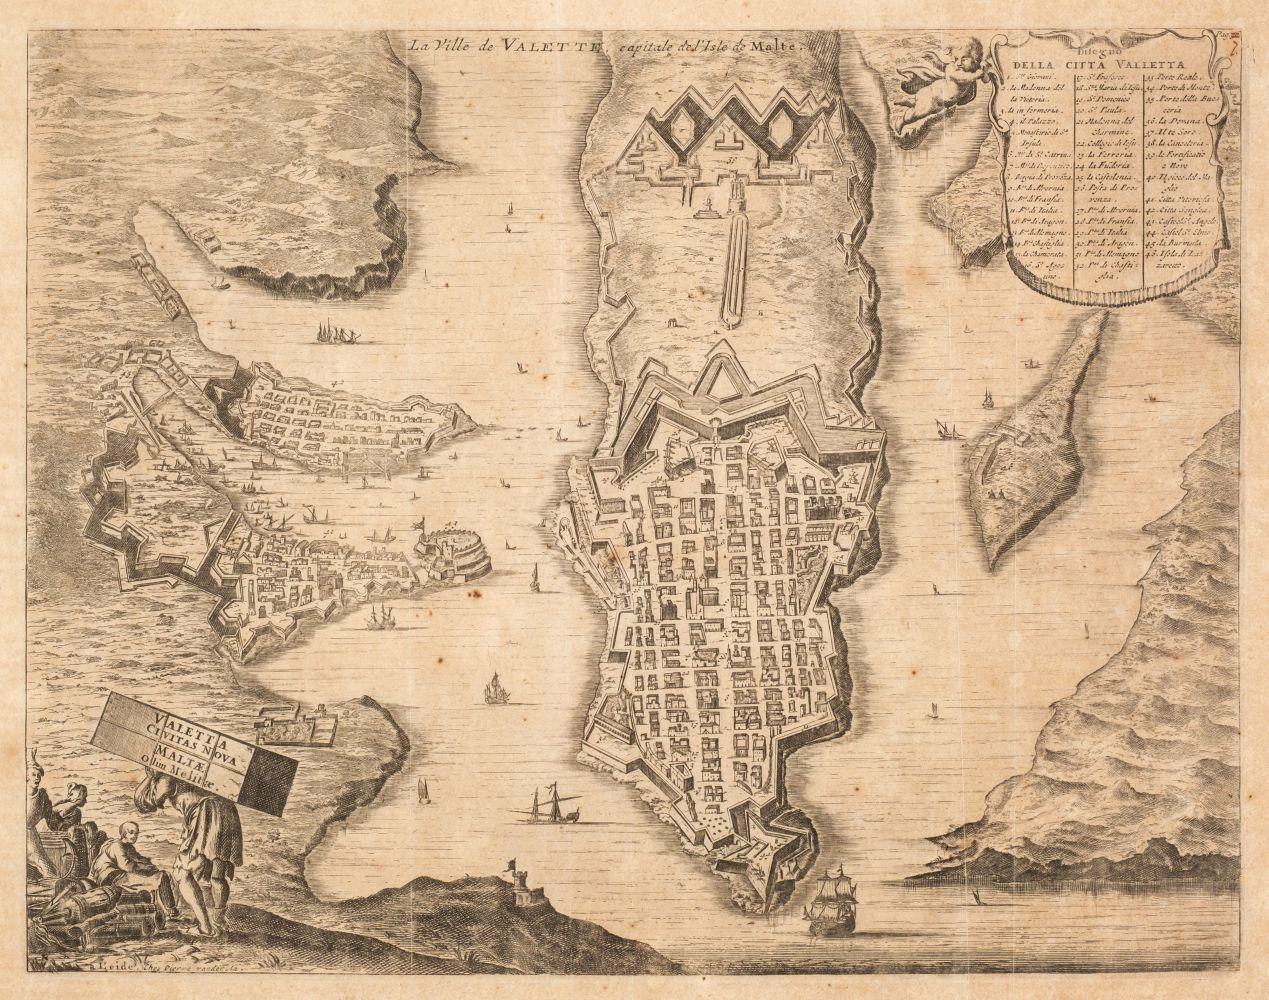 Malta. Vander Aa (Pieter), La Ville de Valette, Capitale de L'Isle de Malte, circa 1720